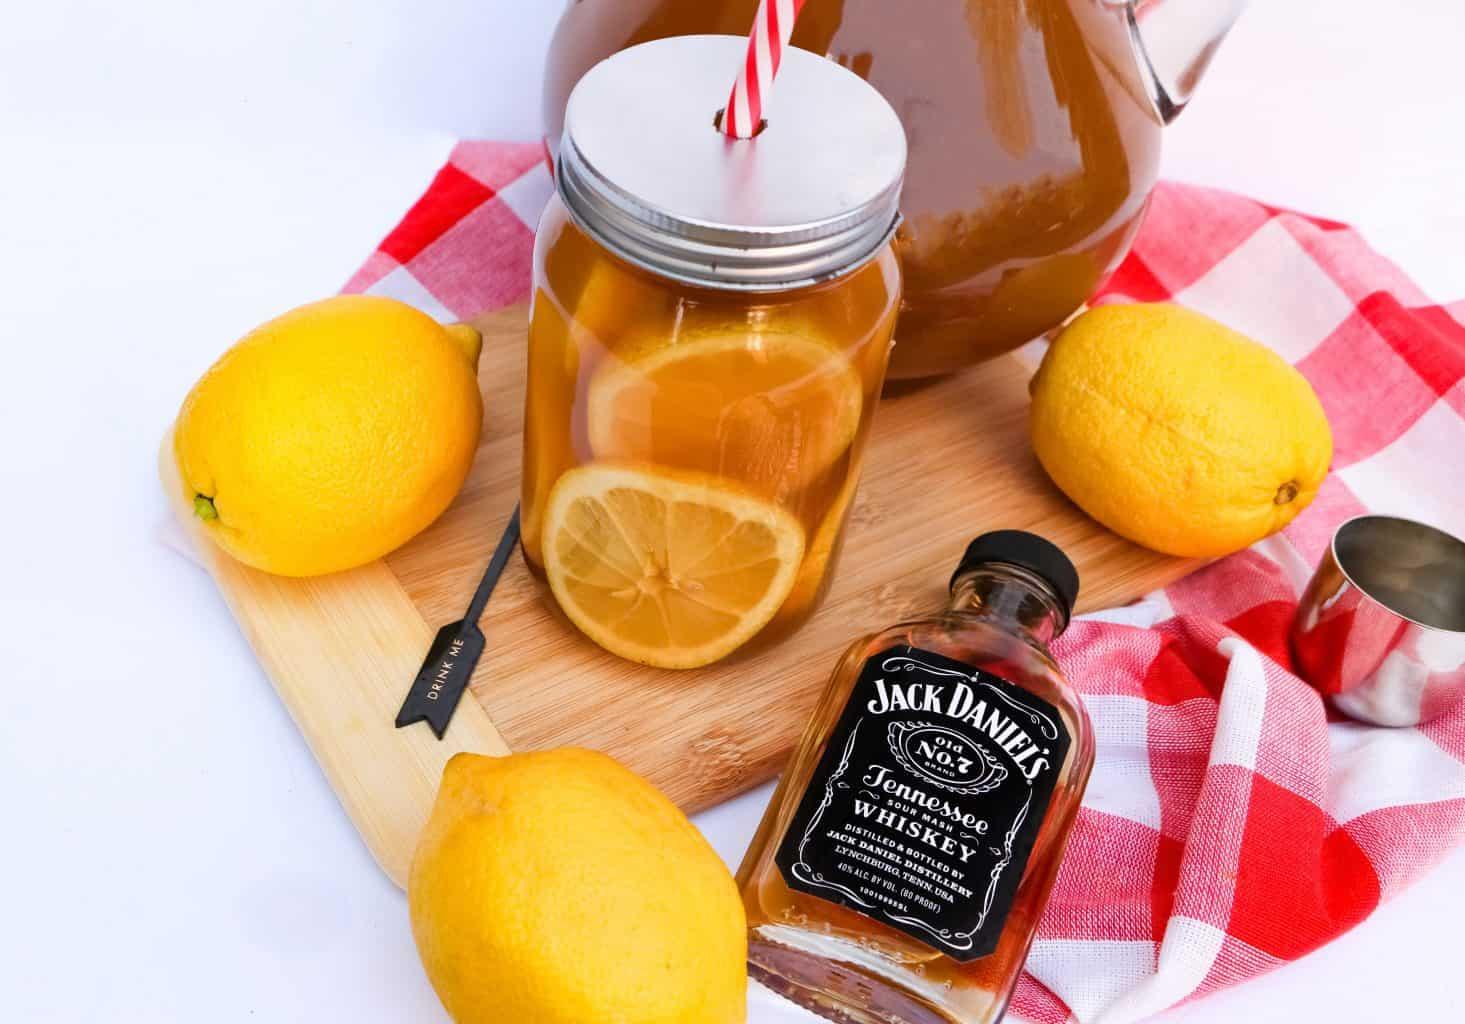 mason jar of spiked tea with jack daniels